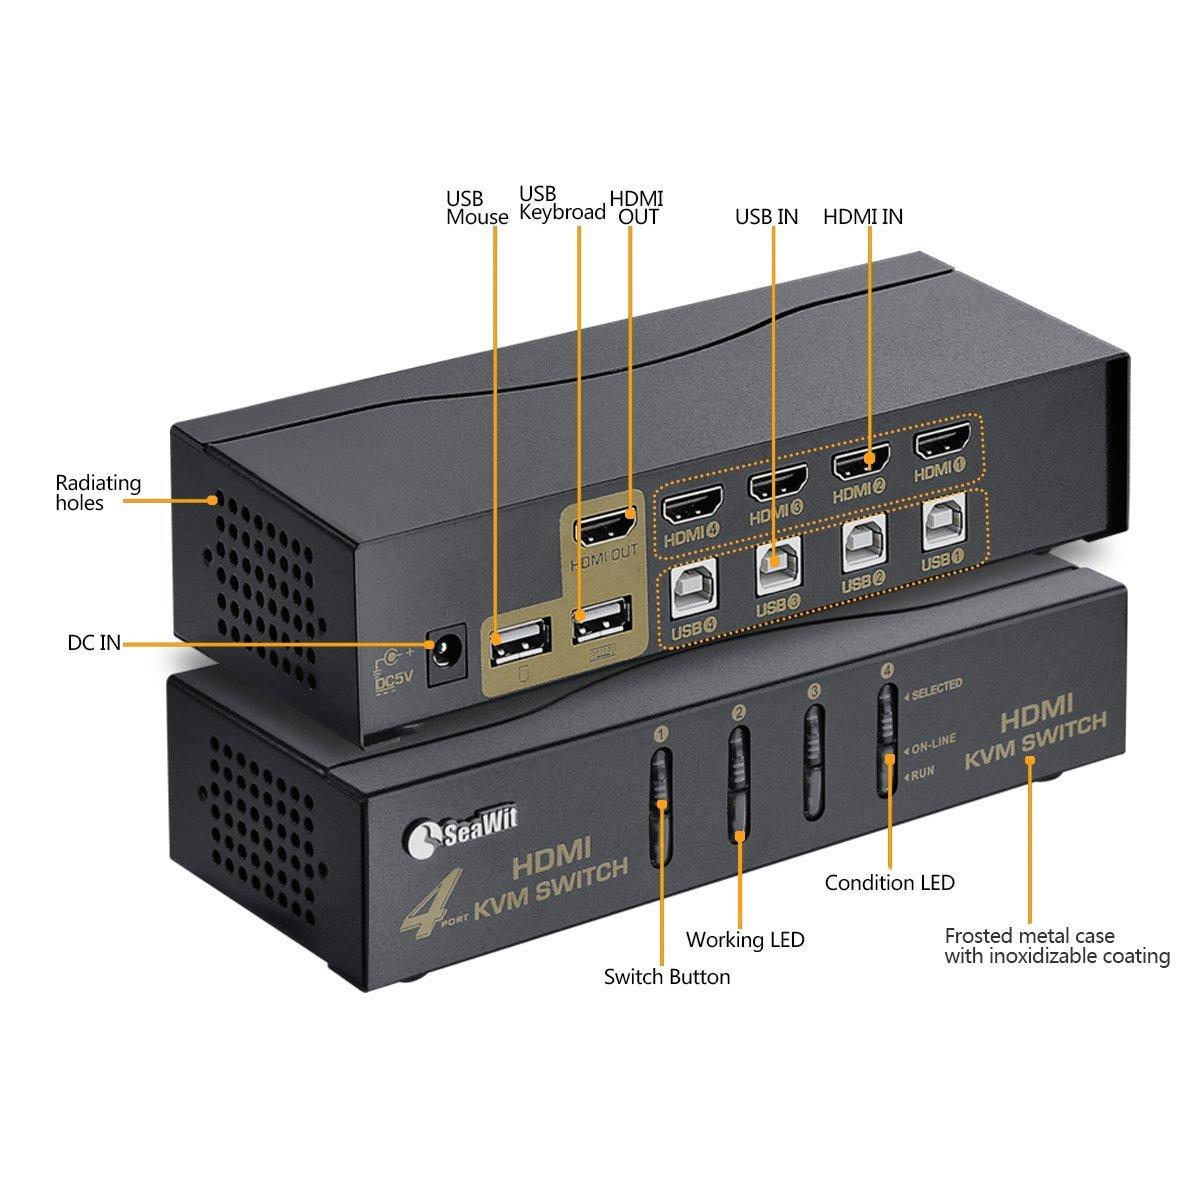 71lM6KX1Y8L._SL1200_ amazon com sea wit hdmi kvm switch 4 ports 4 sets of hdmi & usb  at fashall.co